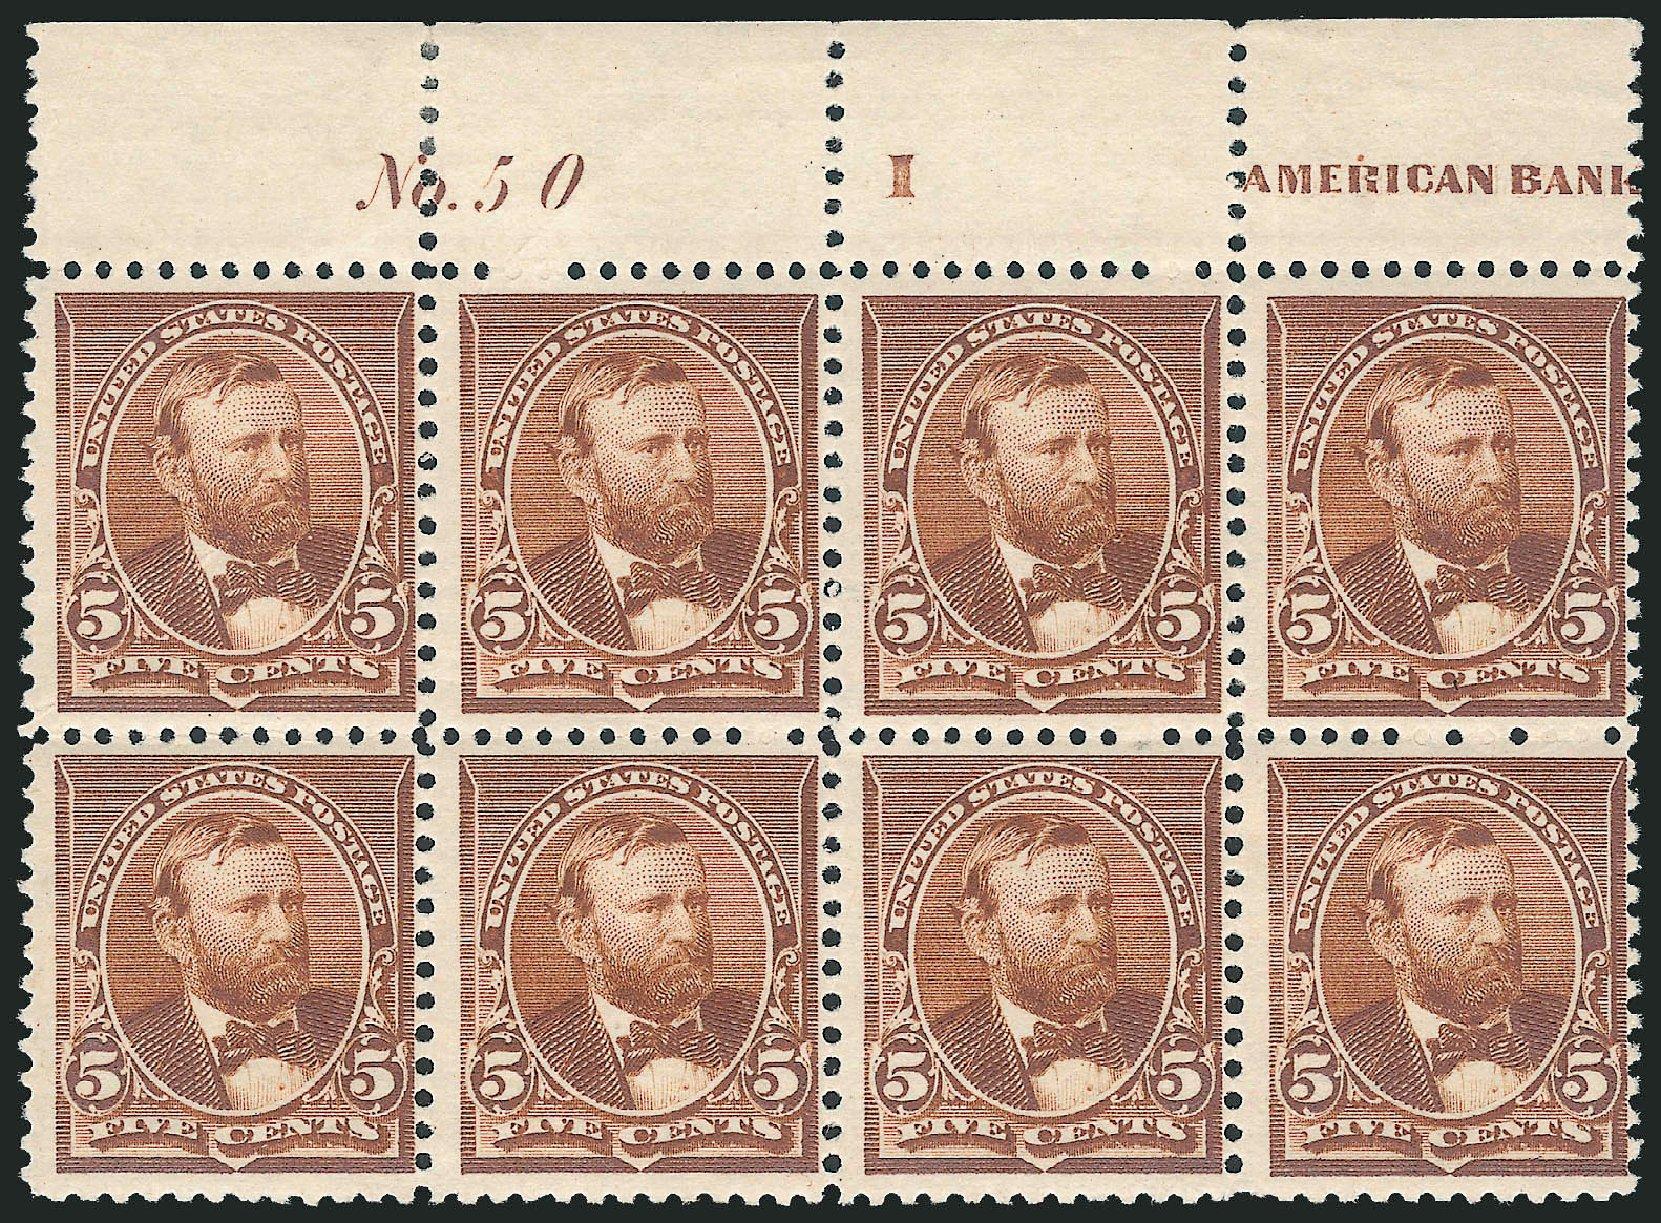 US Stamp Value Scott Catalog 223: 5c 1890 Grant. Robert Siegel Auction Galleries, Dec 2012, Sale 1037, Lot 1779